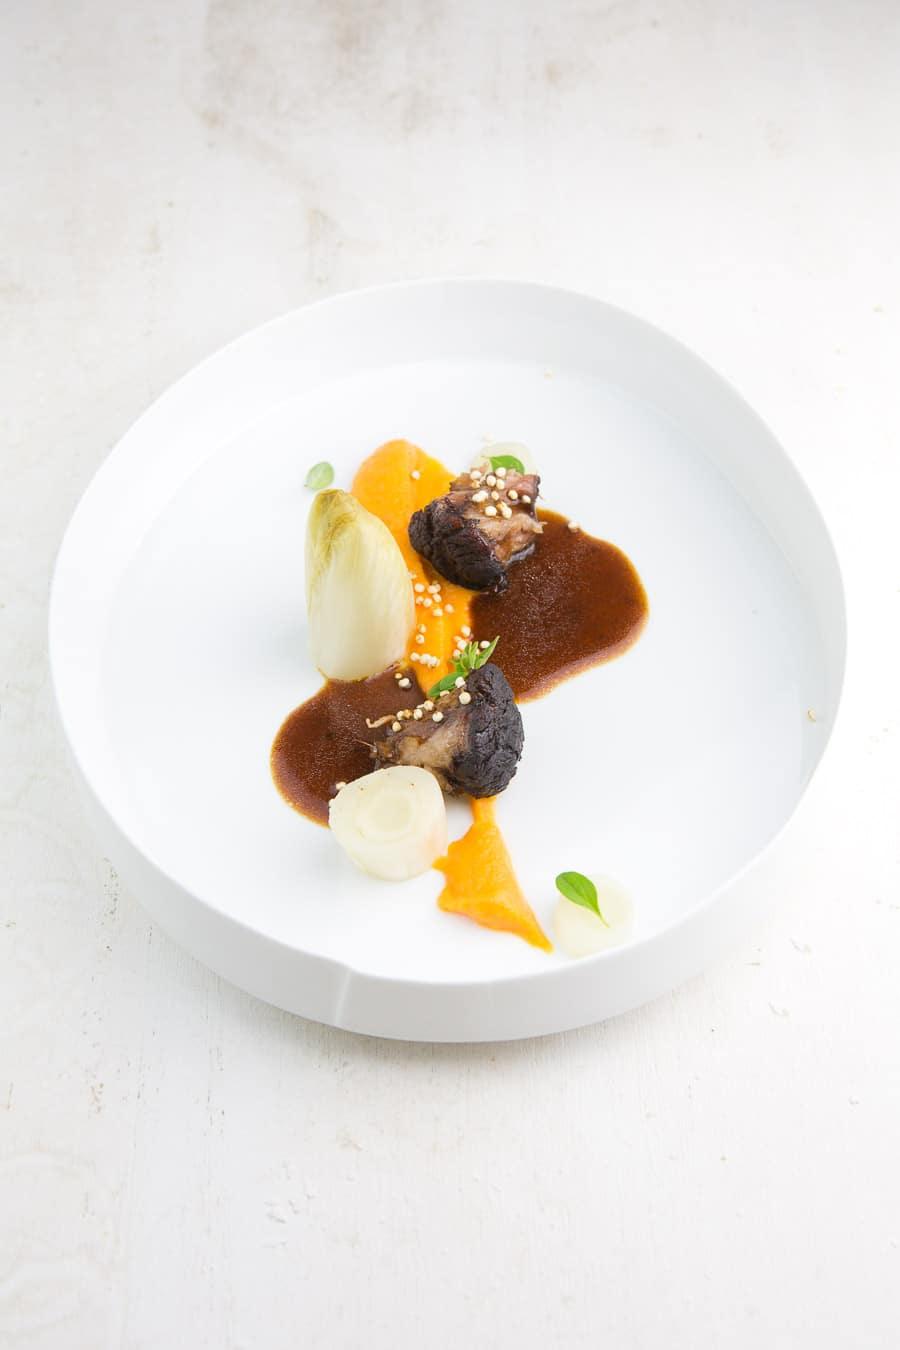 Geschmorter Ochsenschwanz mit Mole-Sauce, Chicorée und Süßkartoffel-Püree